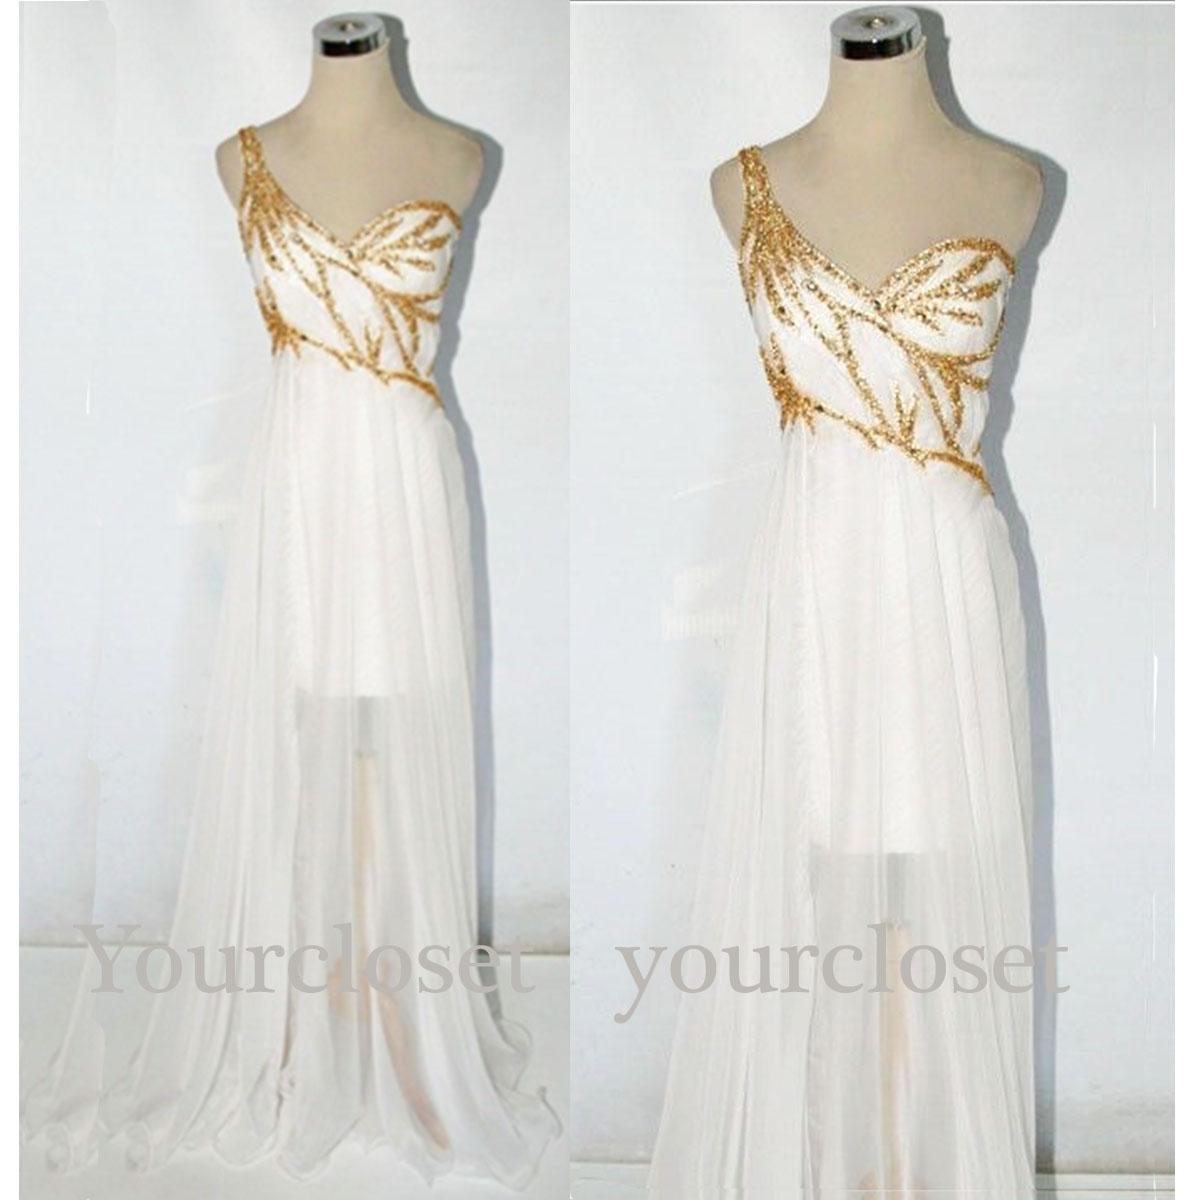 ... chiffon long golder sequins prom dress, graduation dress, party dress